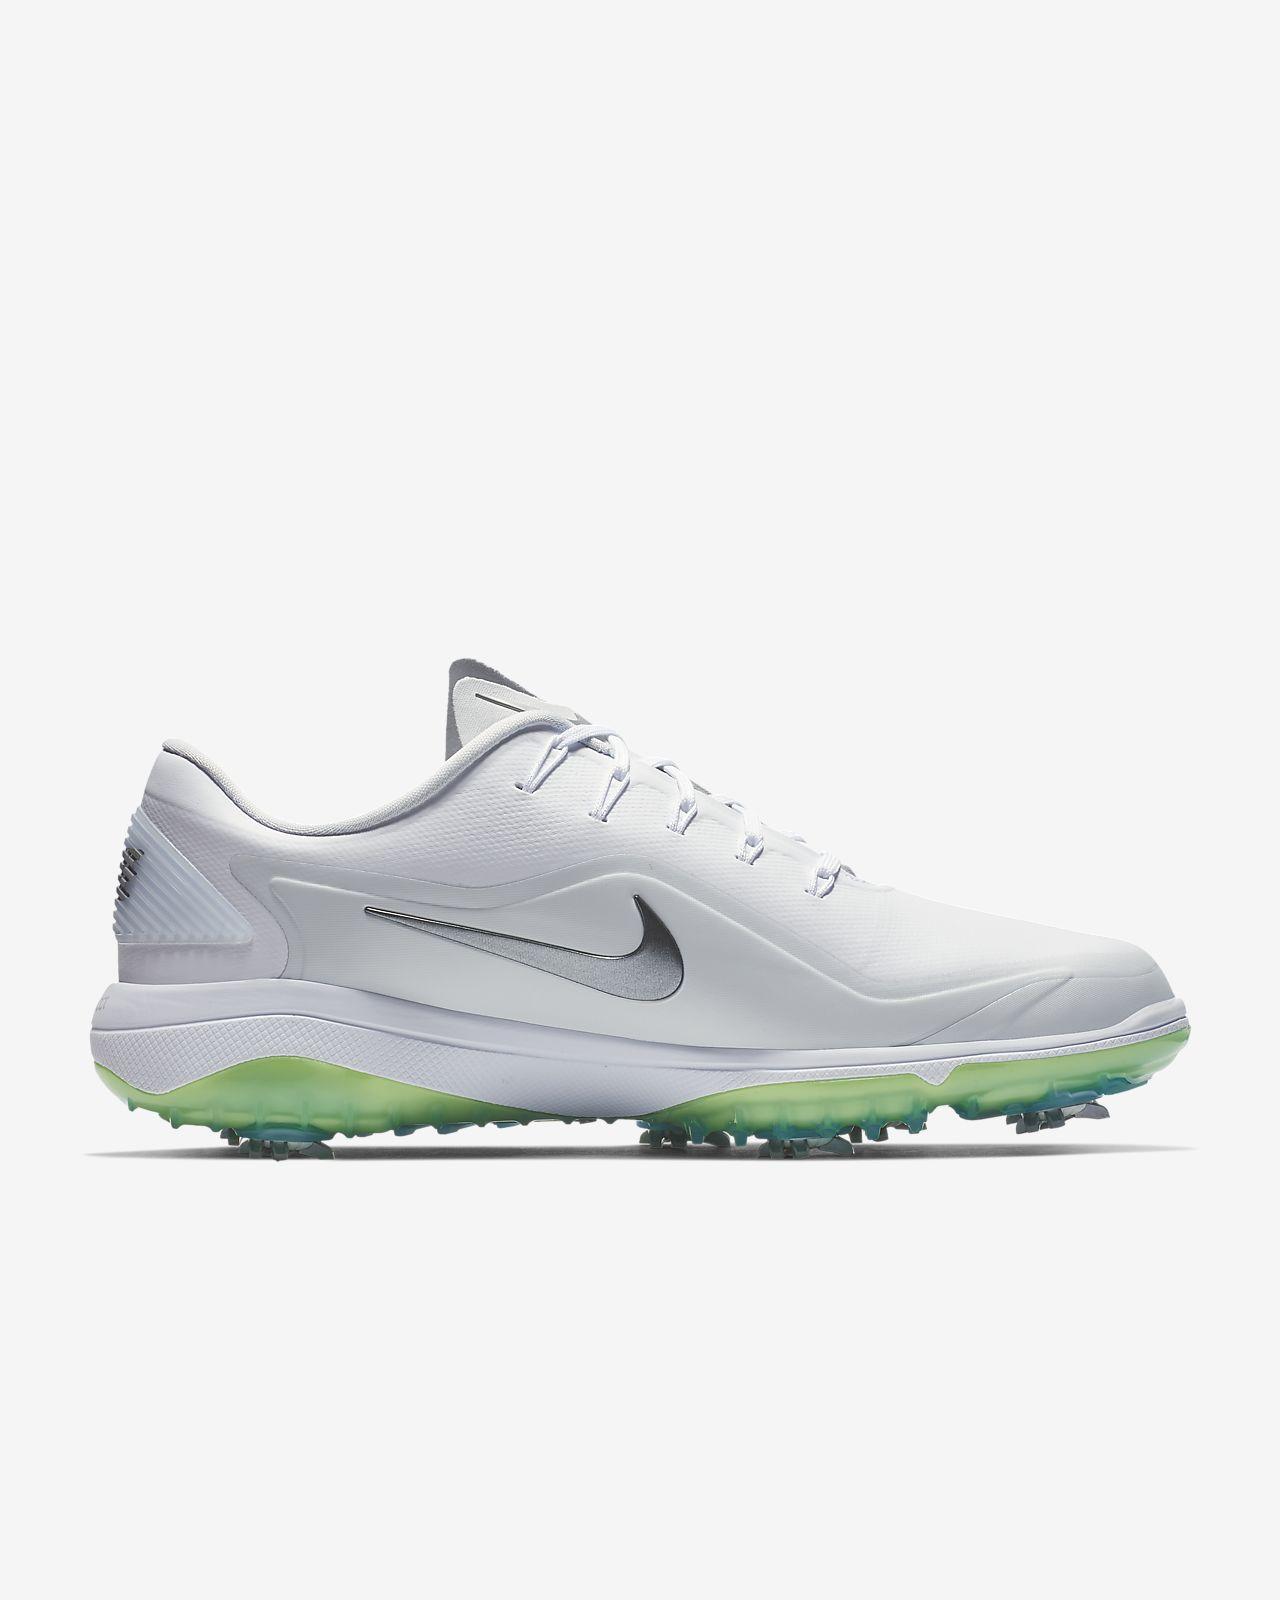 bbcd1c791b8 Nike React Vapor 2 Men s Golf Shoe. Nike.com